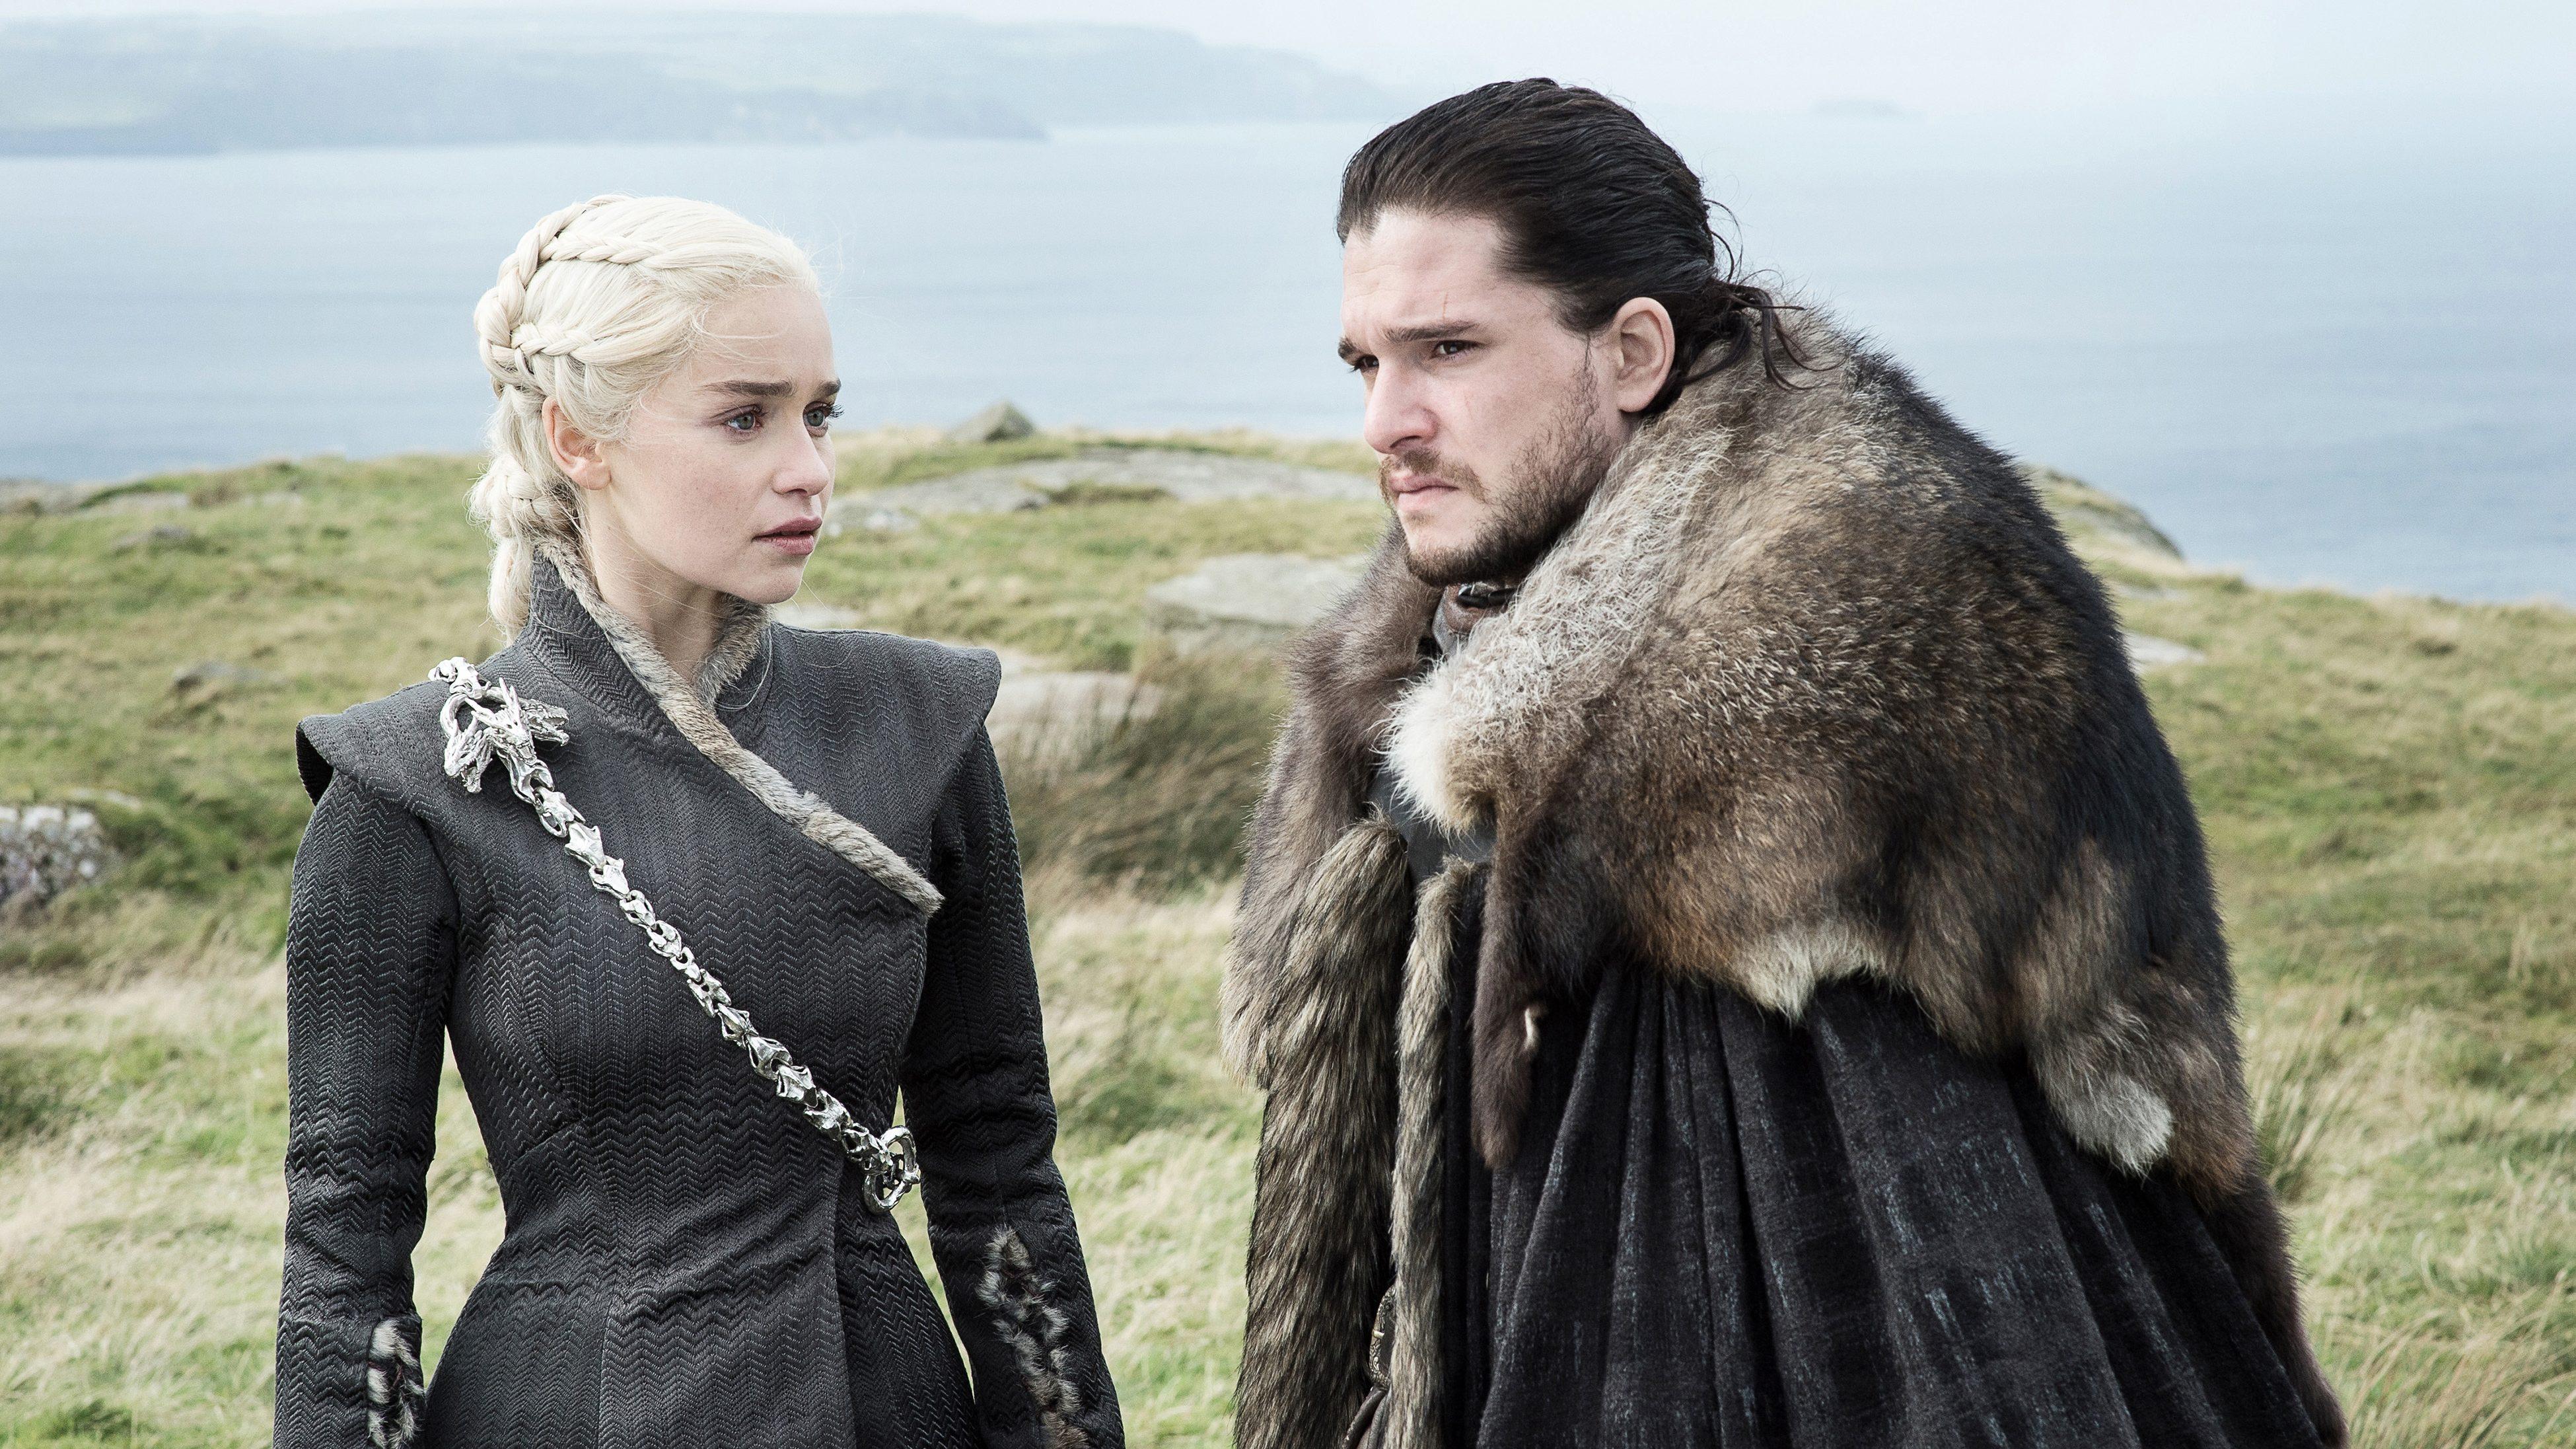 Game of Thrones stars in season 7